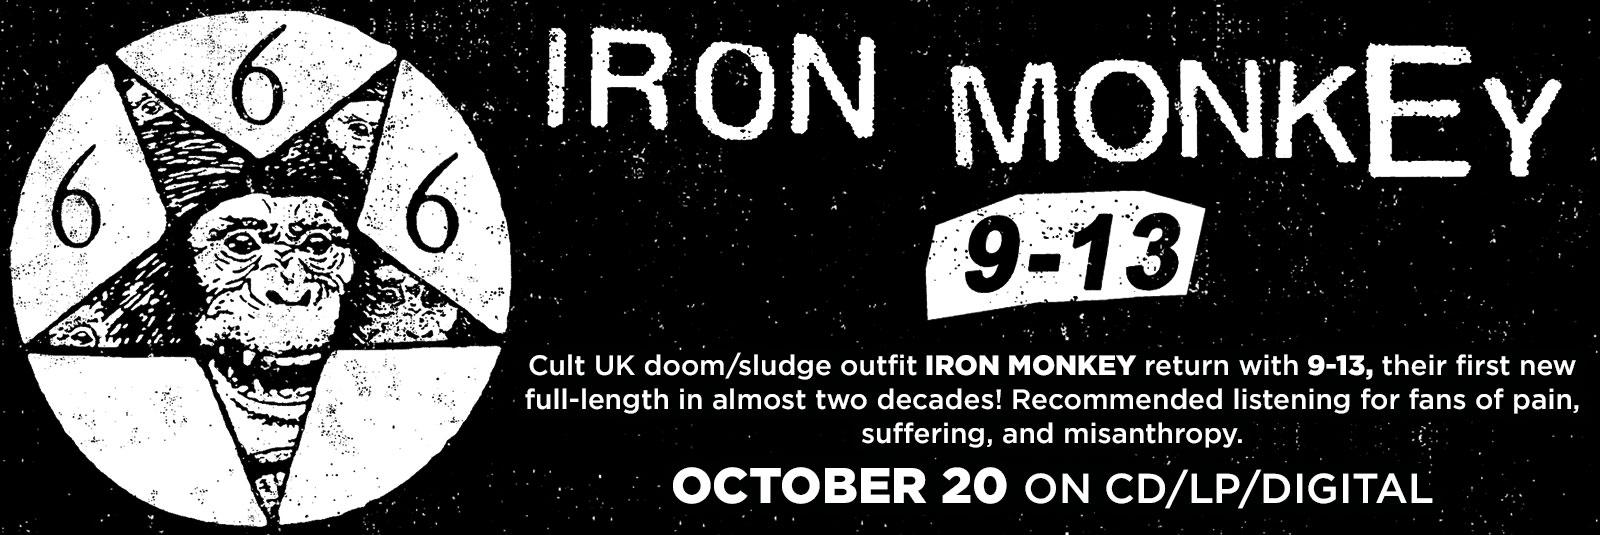 iron monkey 9-13